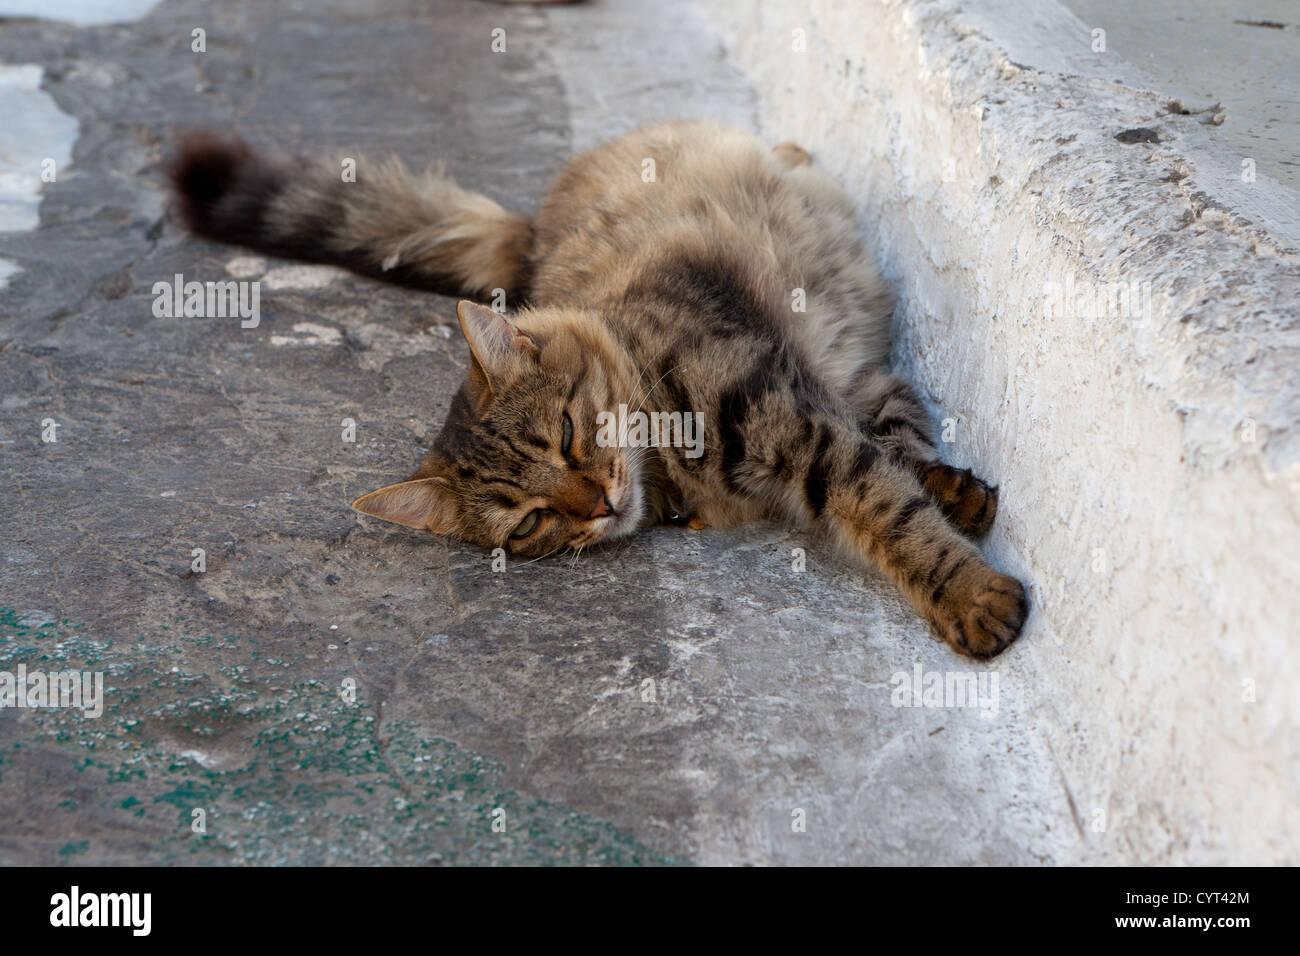 Street tabby cat lies on the асфольте and sleeps Stock Photo